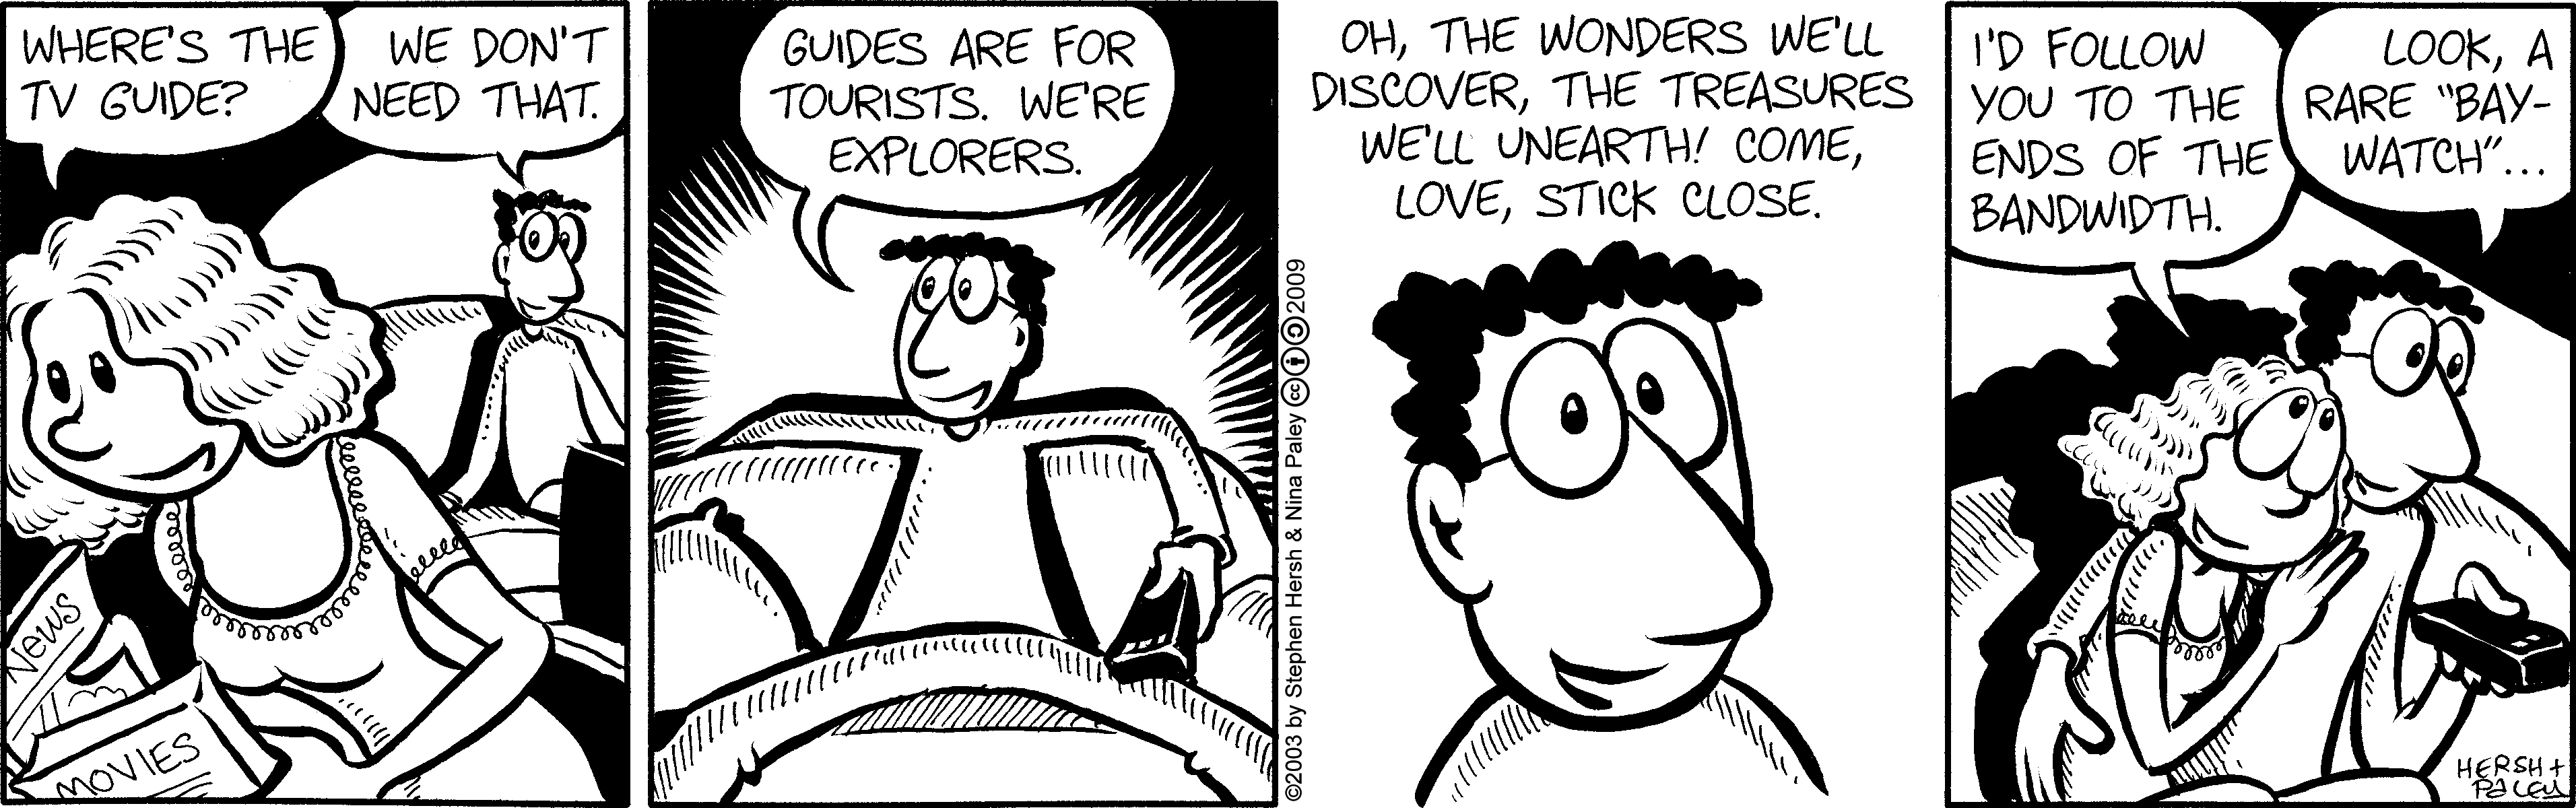 Tvexplorers